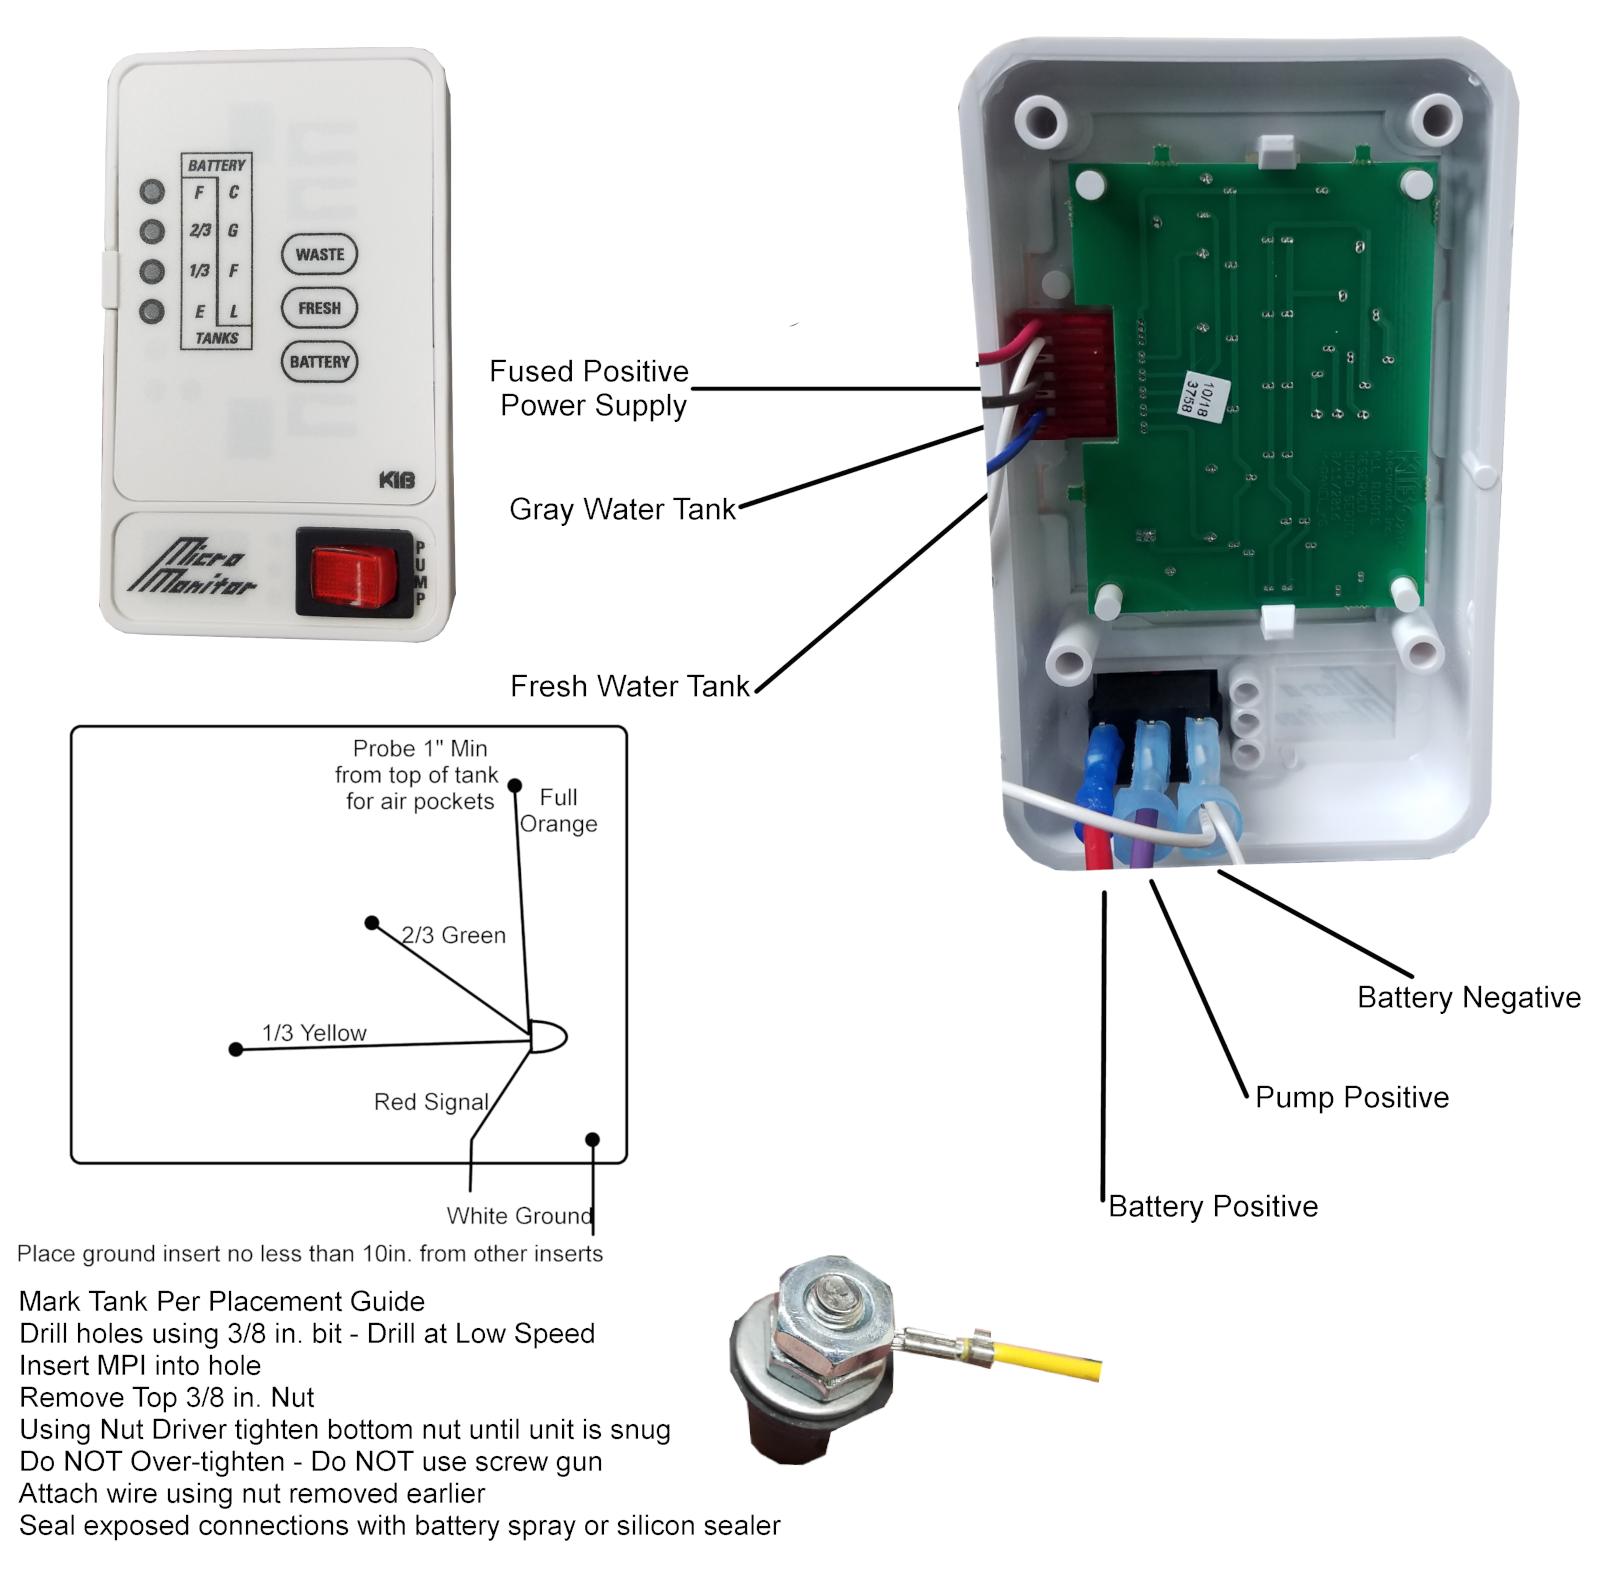 kib 2 tank monitor panel 12 volt white face plate [ 1600 x 1581 Pixel ]